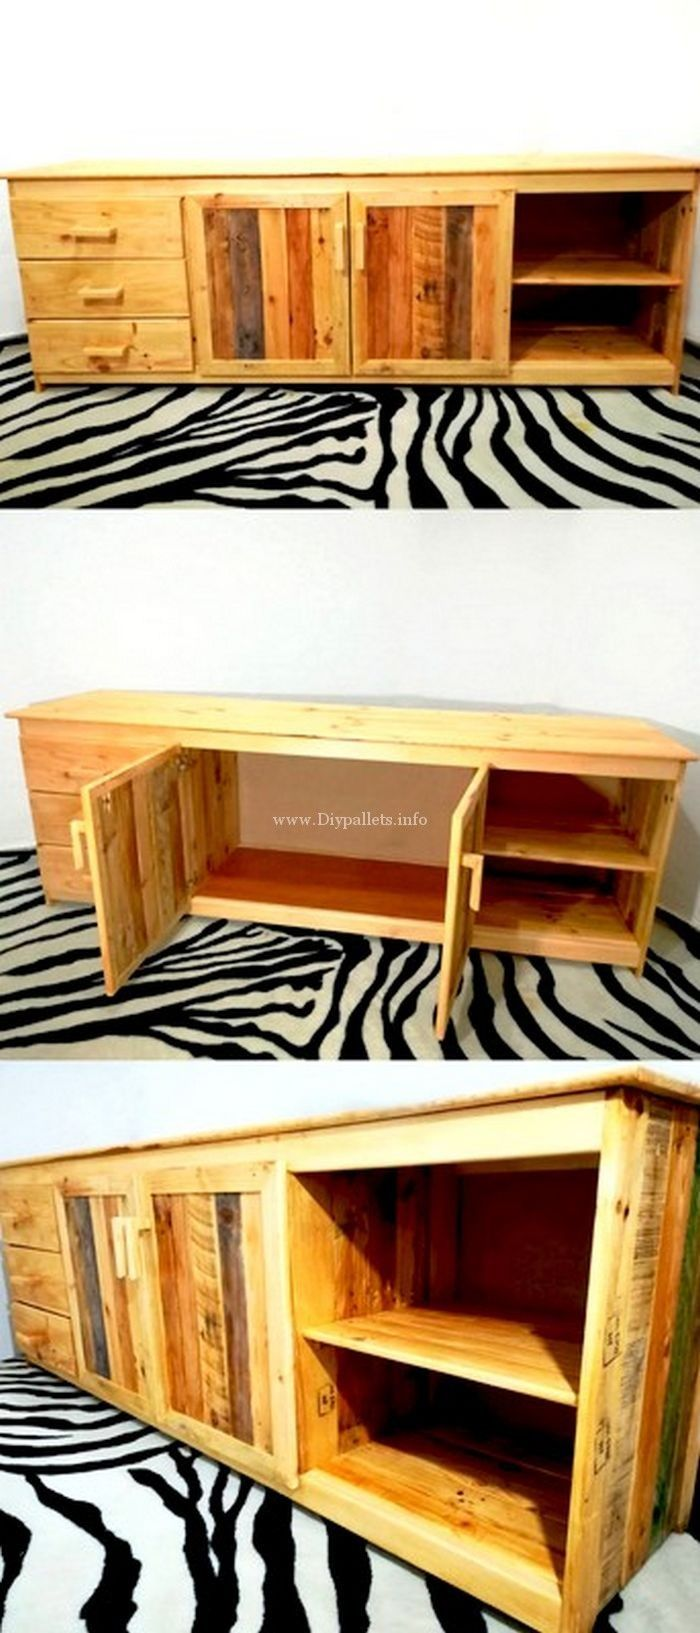 innovative diy wooden pallet projects within less money pallet rh pinterest com